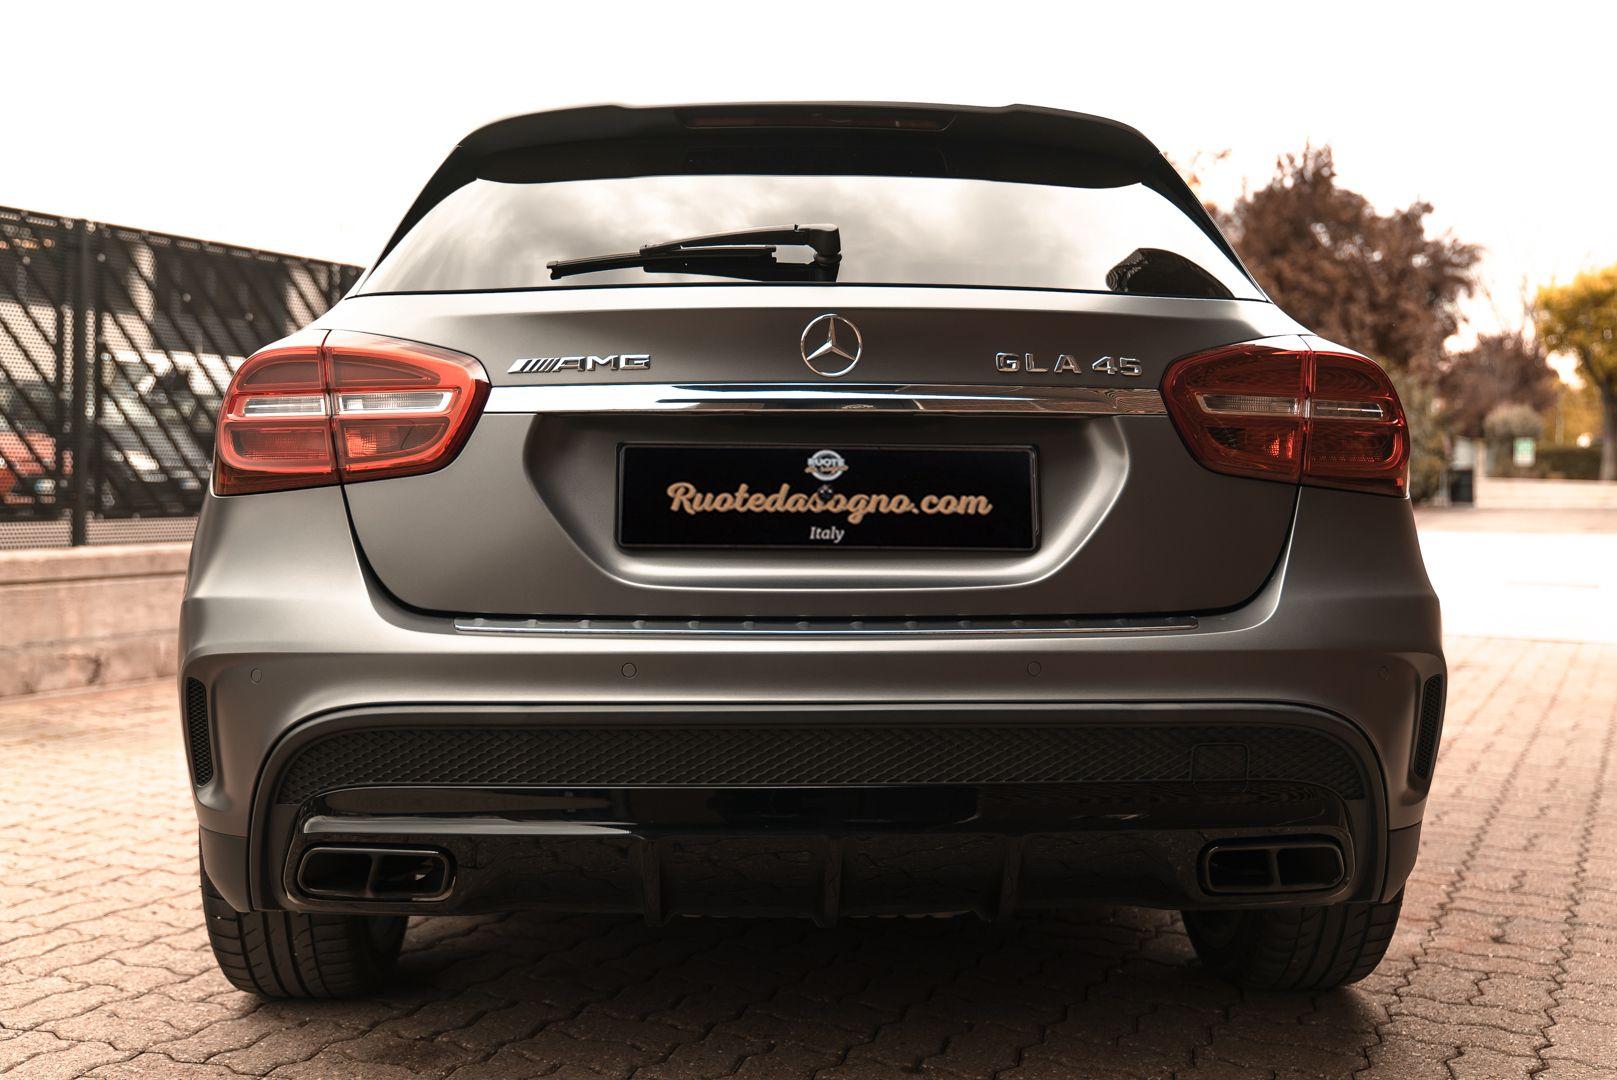 2015 Mercedes-Benz GLA AMG 45 68294